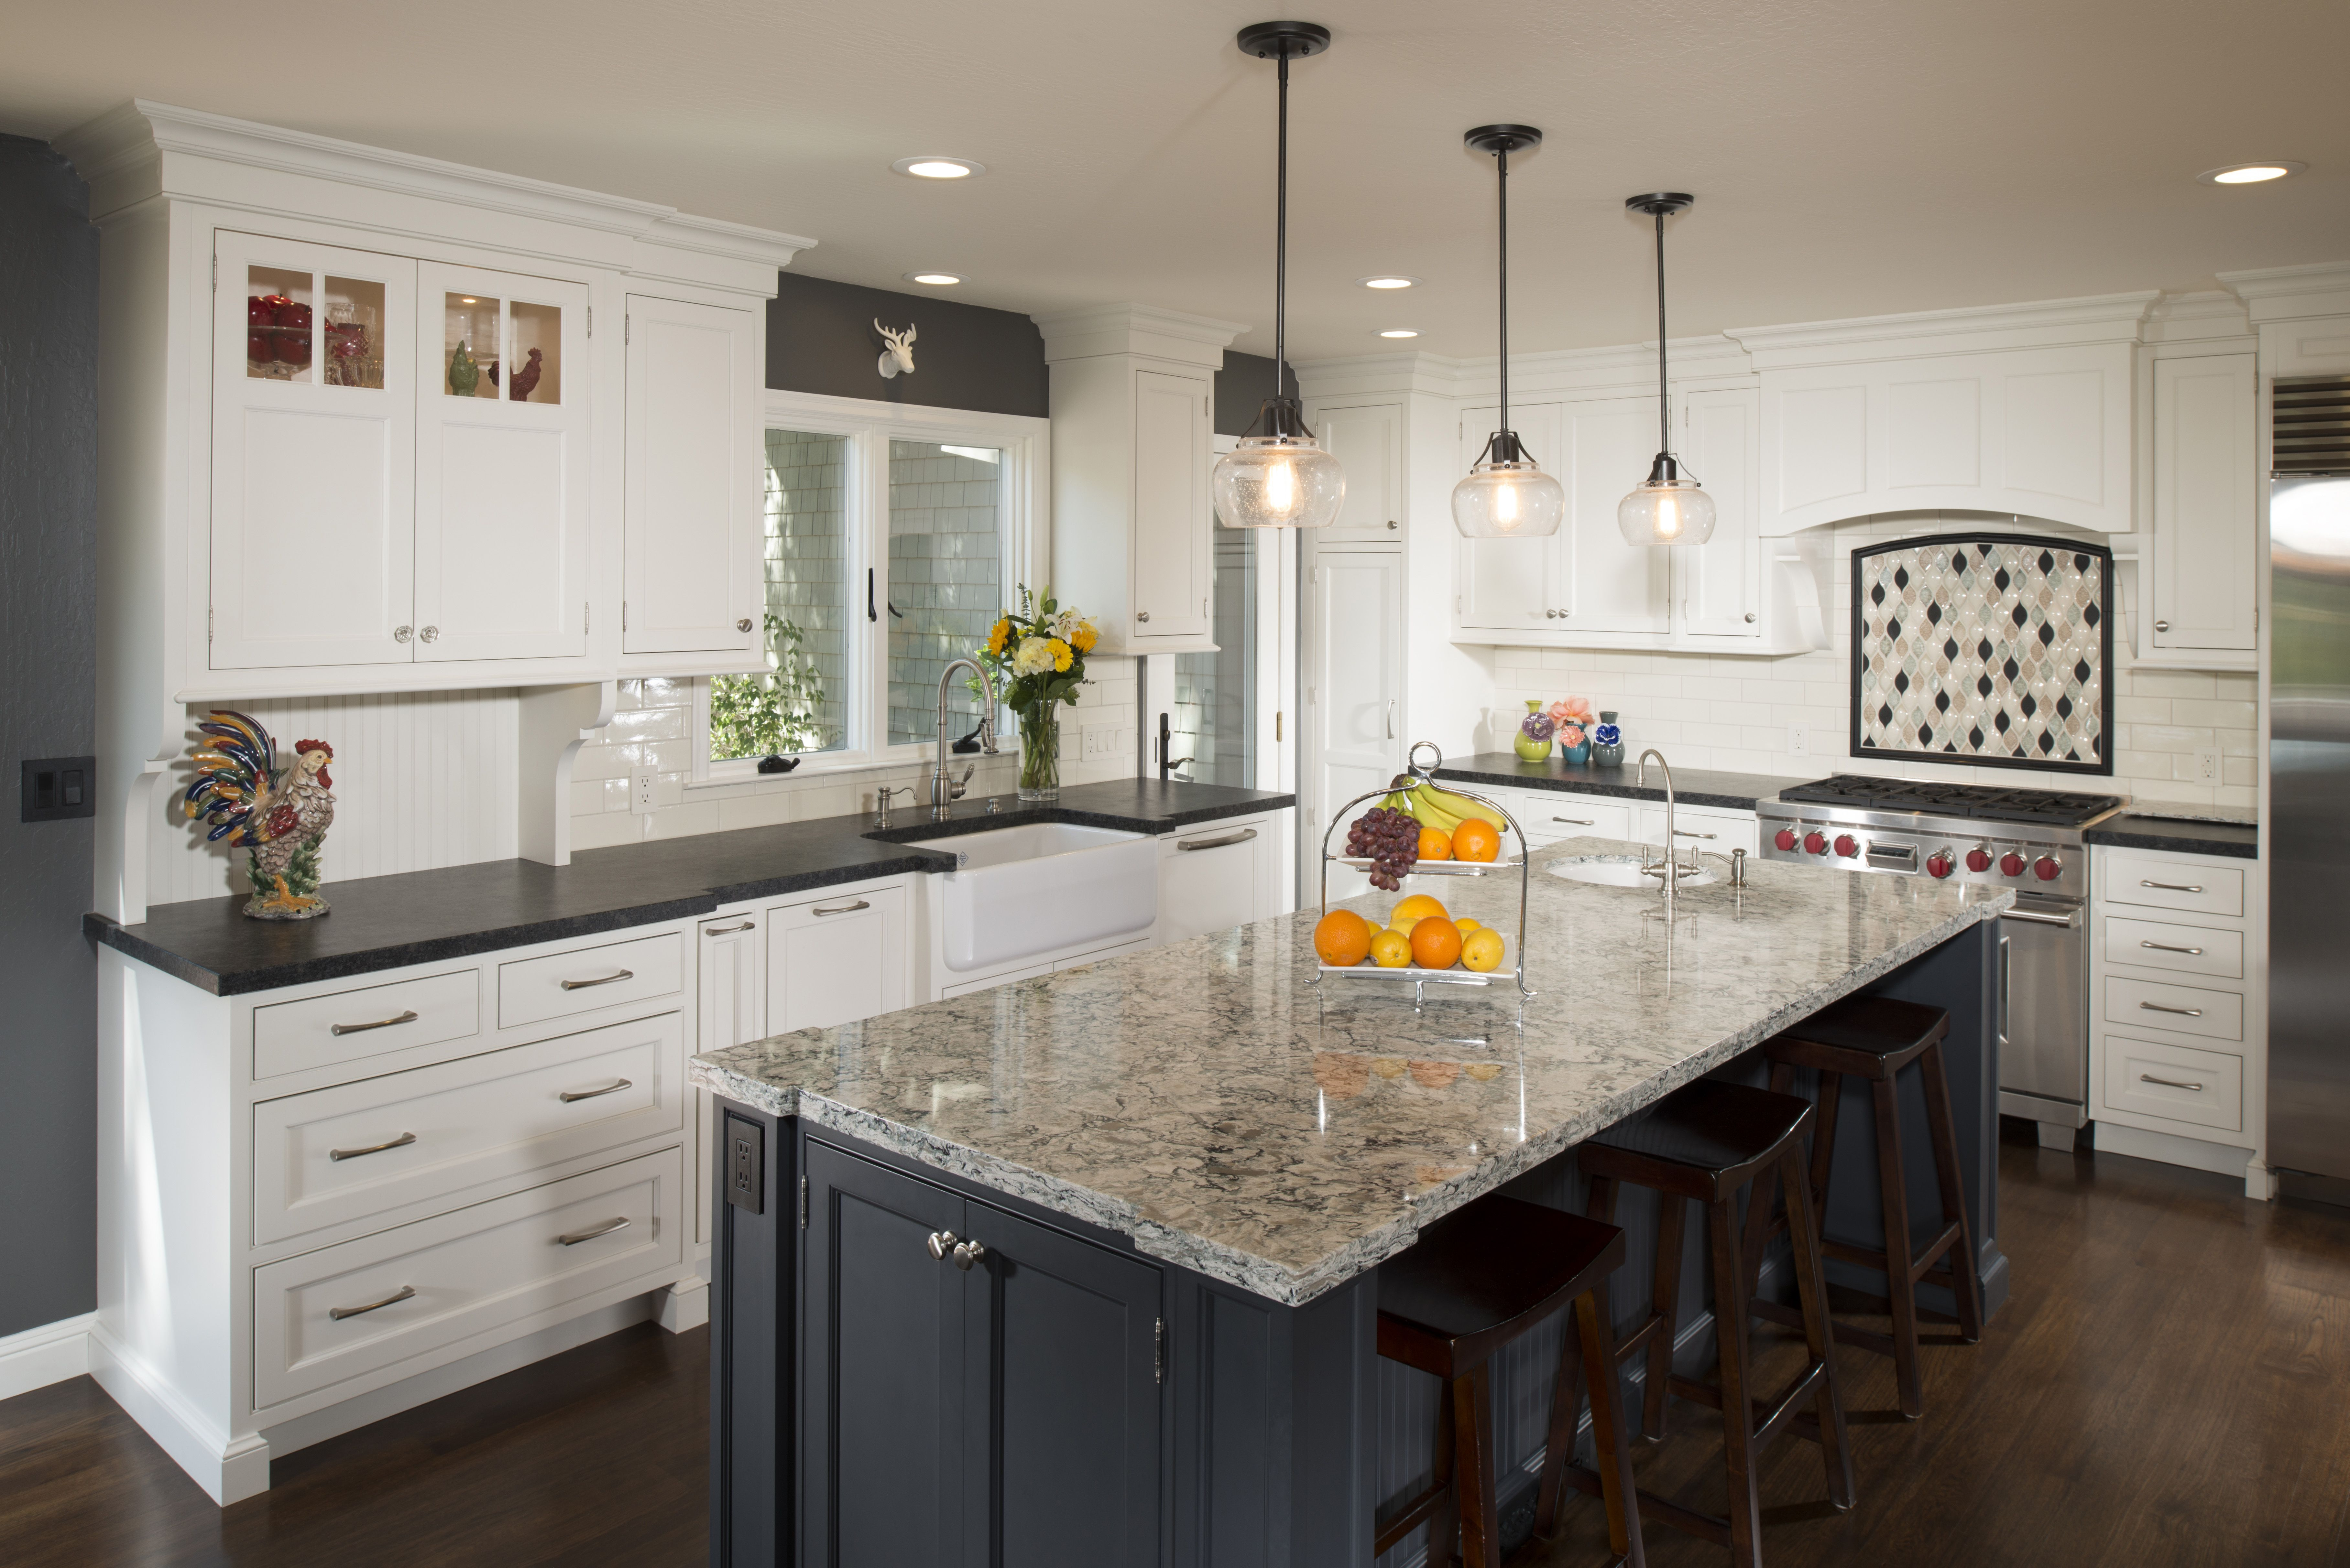 Kitchen with contrast color. White perimeter